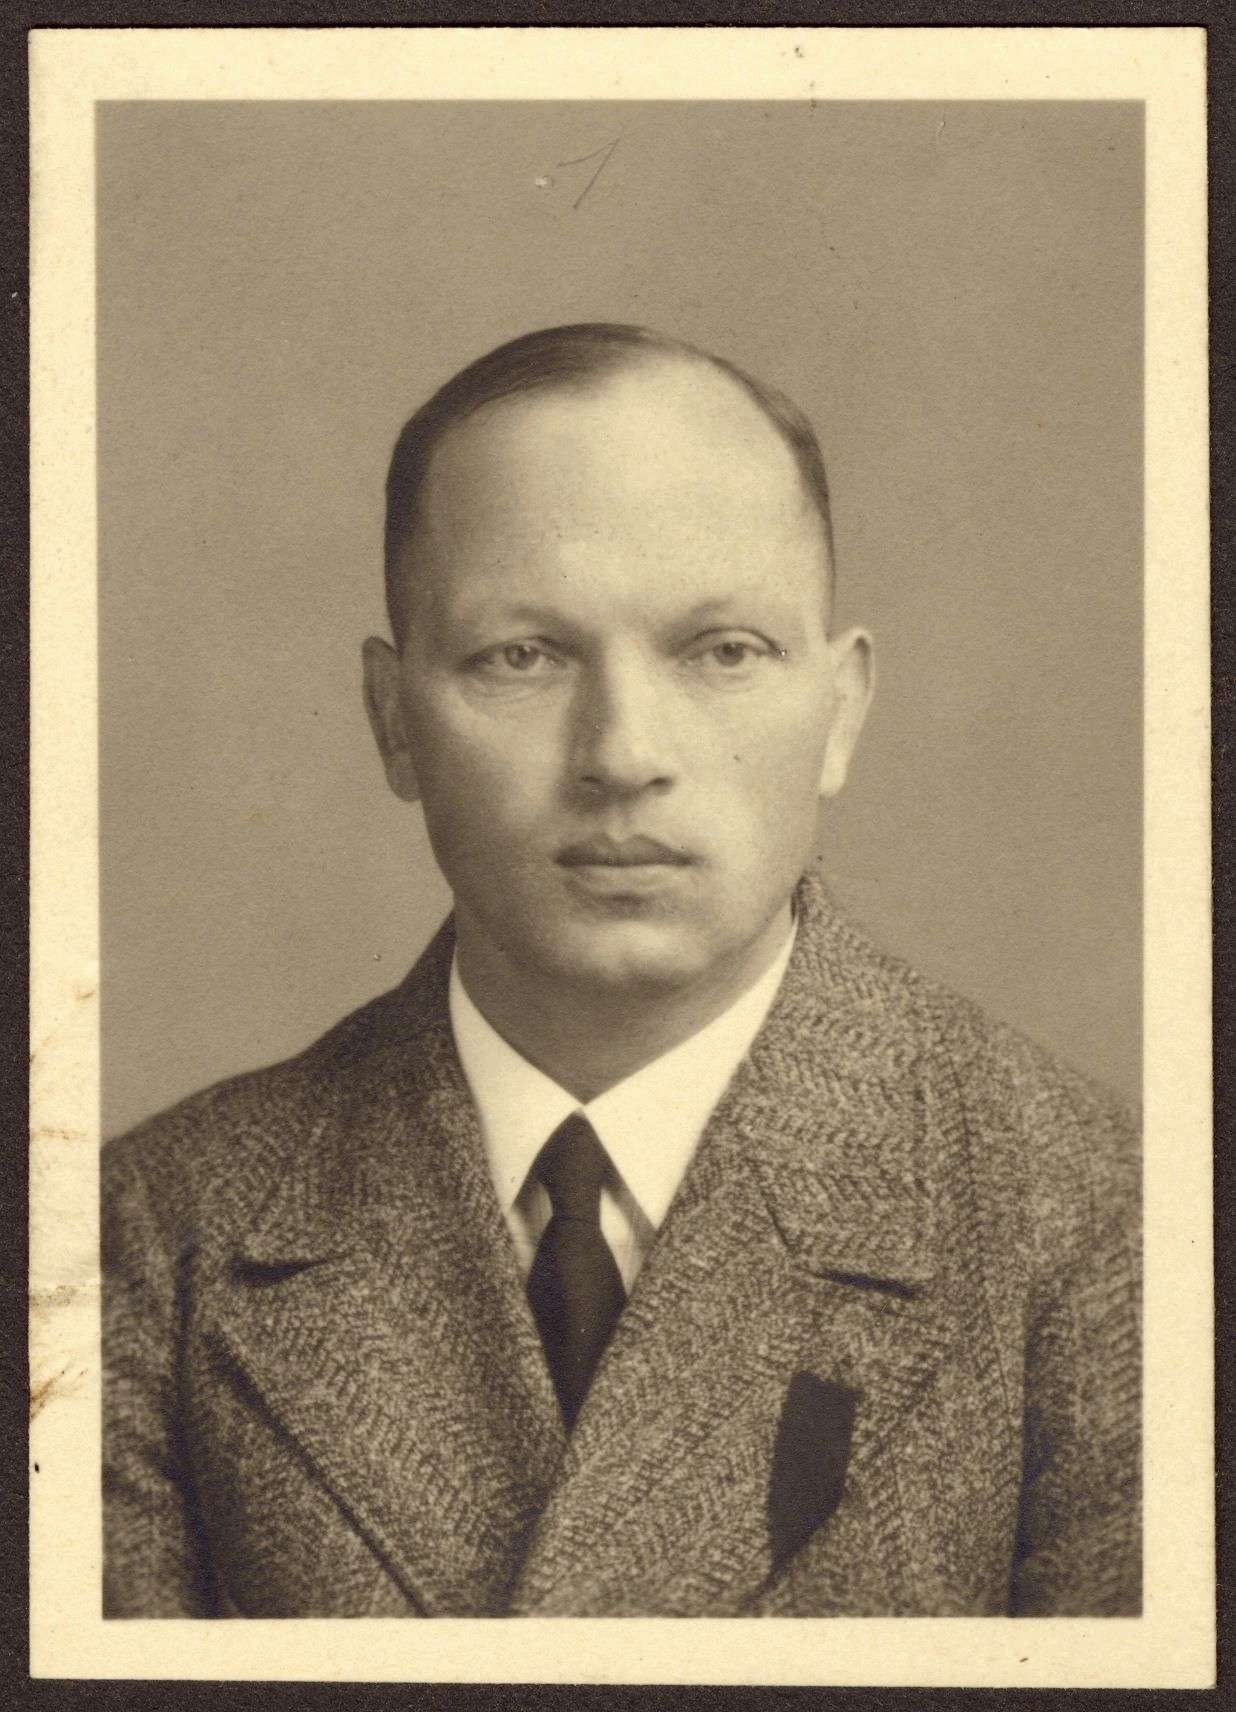 Abbrecht, Friedrich Eugen, Bild 1